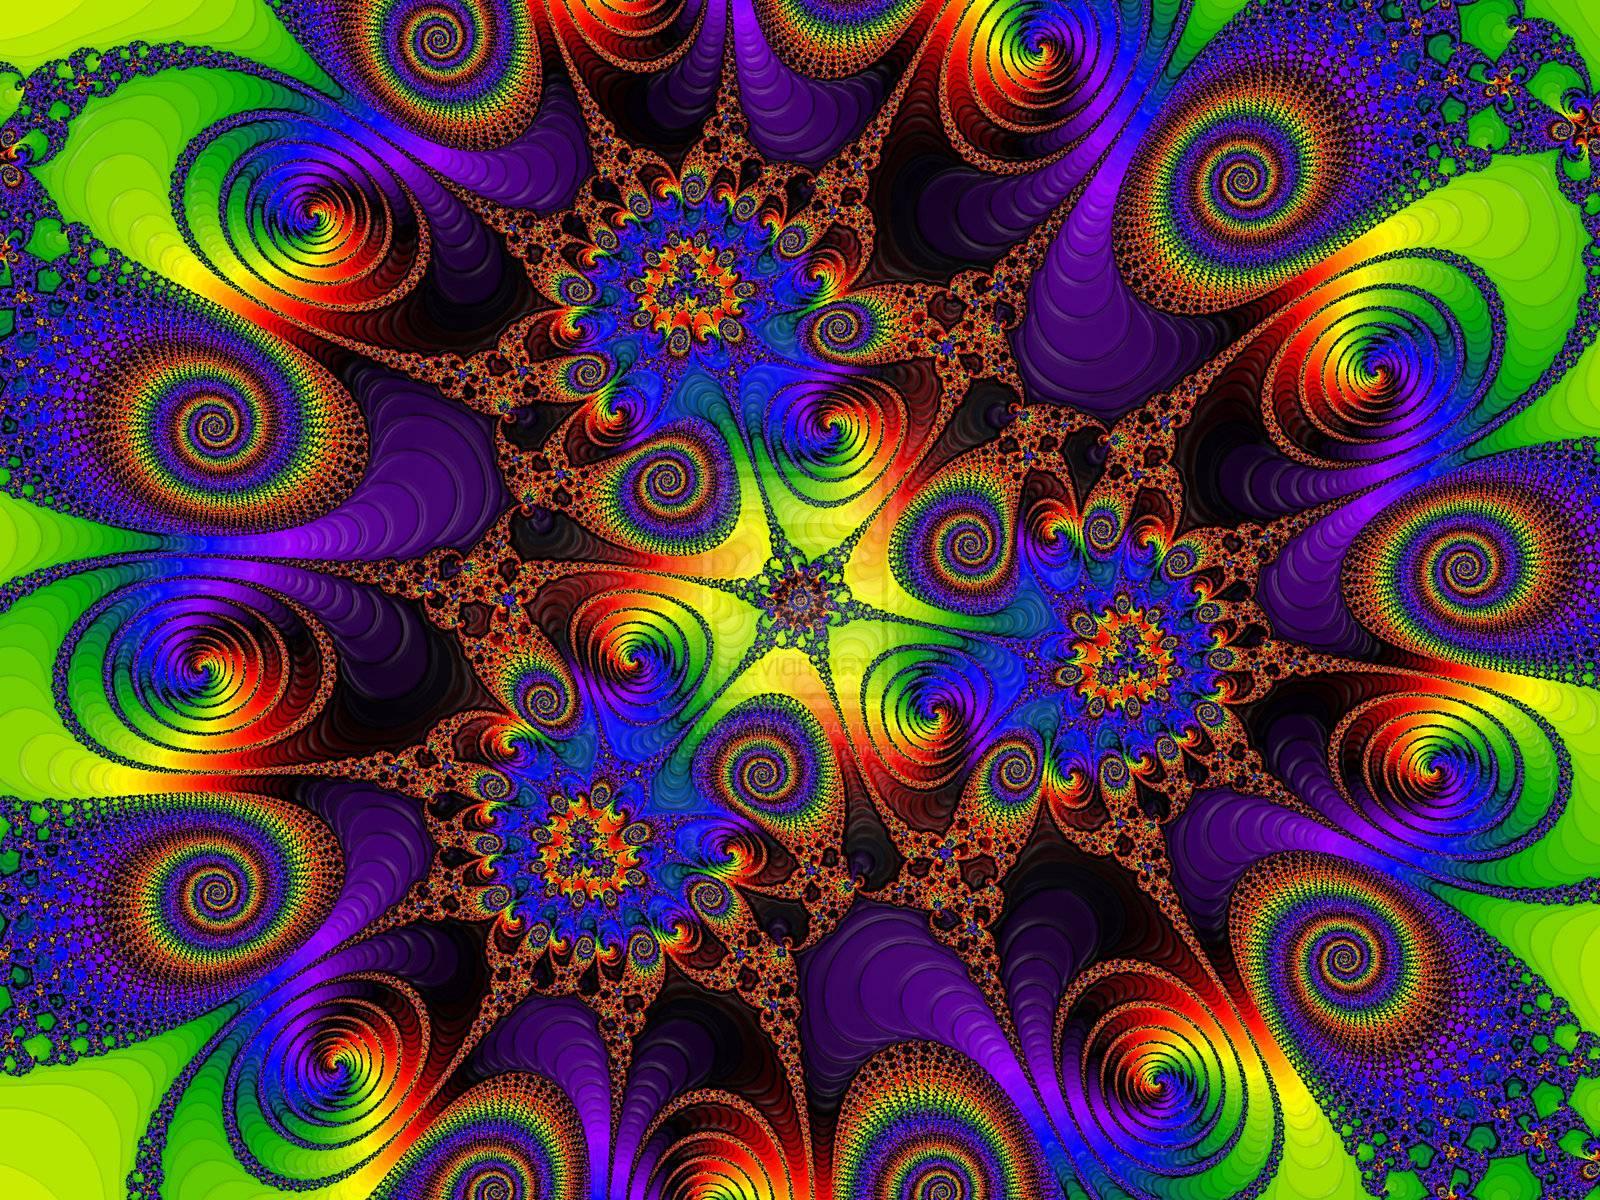 Acid Trip Wallpapers 1600x1200